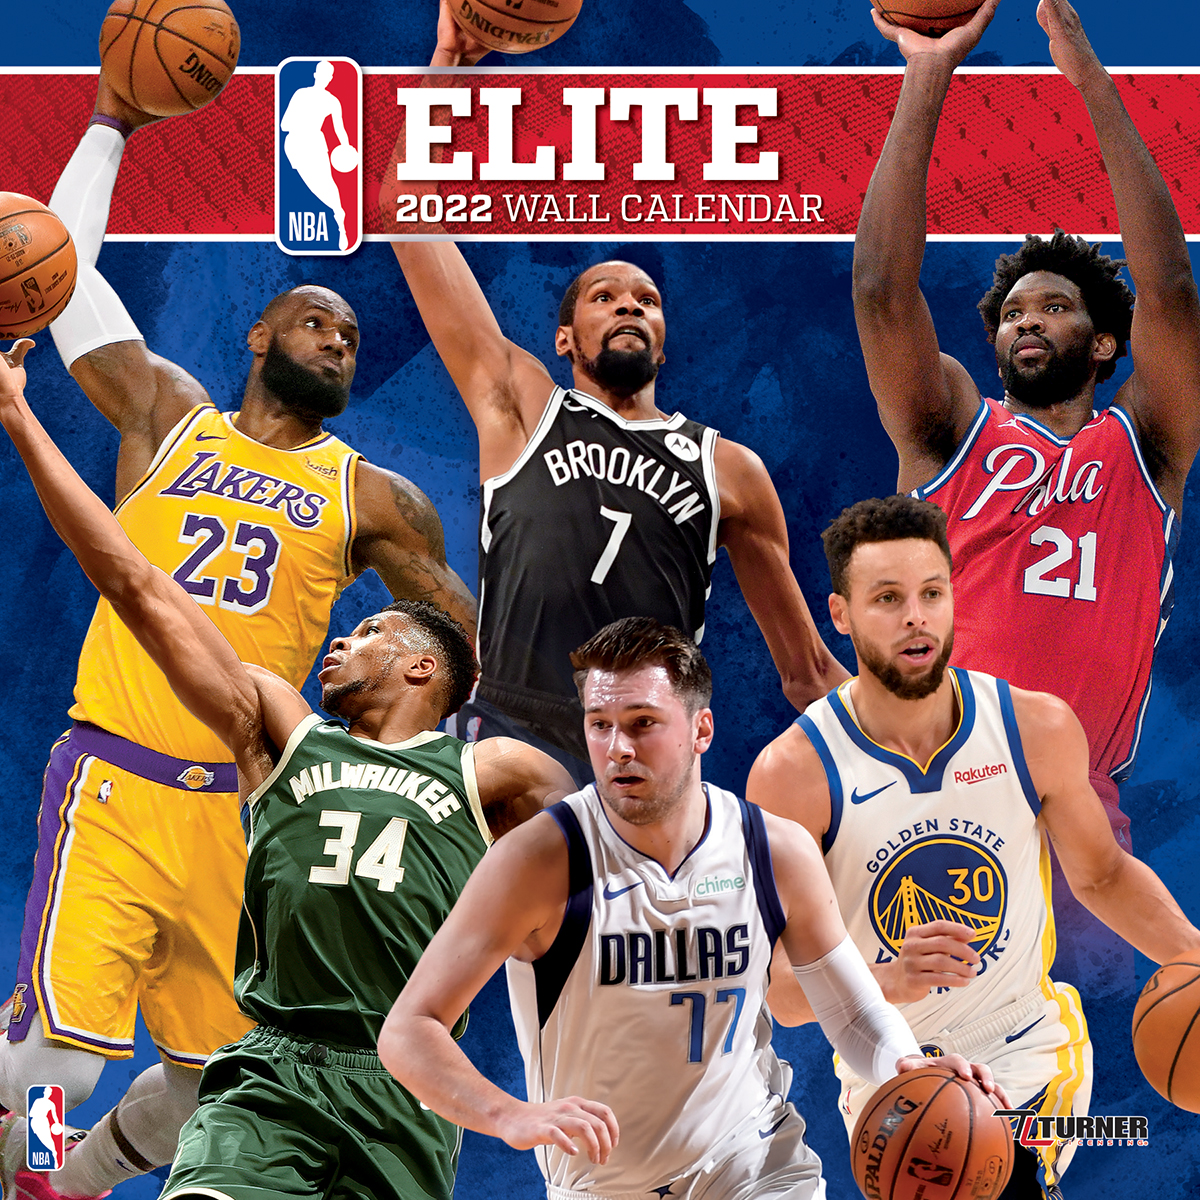 eeadcdbc NBA ELITE 2019 NBA Wall Calendar - Buy at KHC Sports